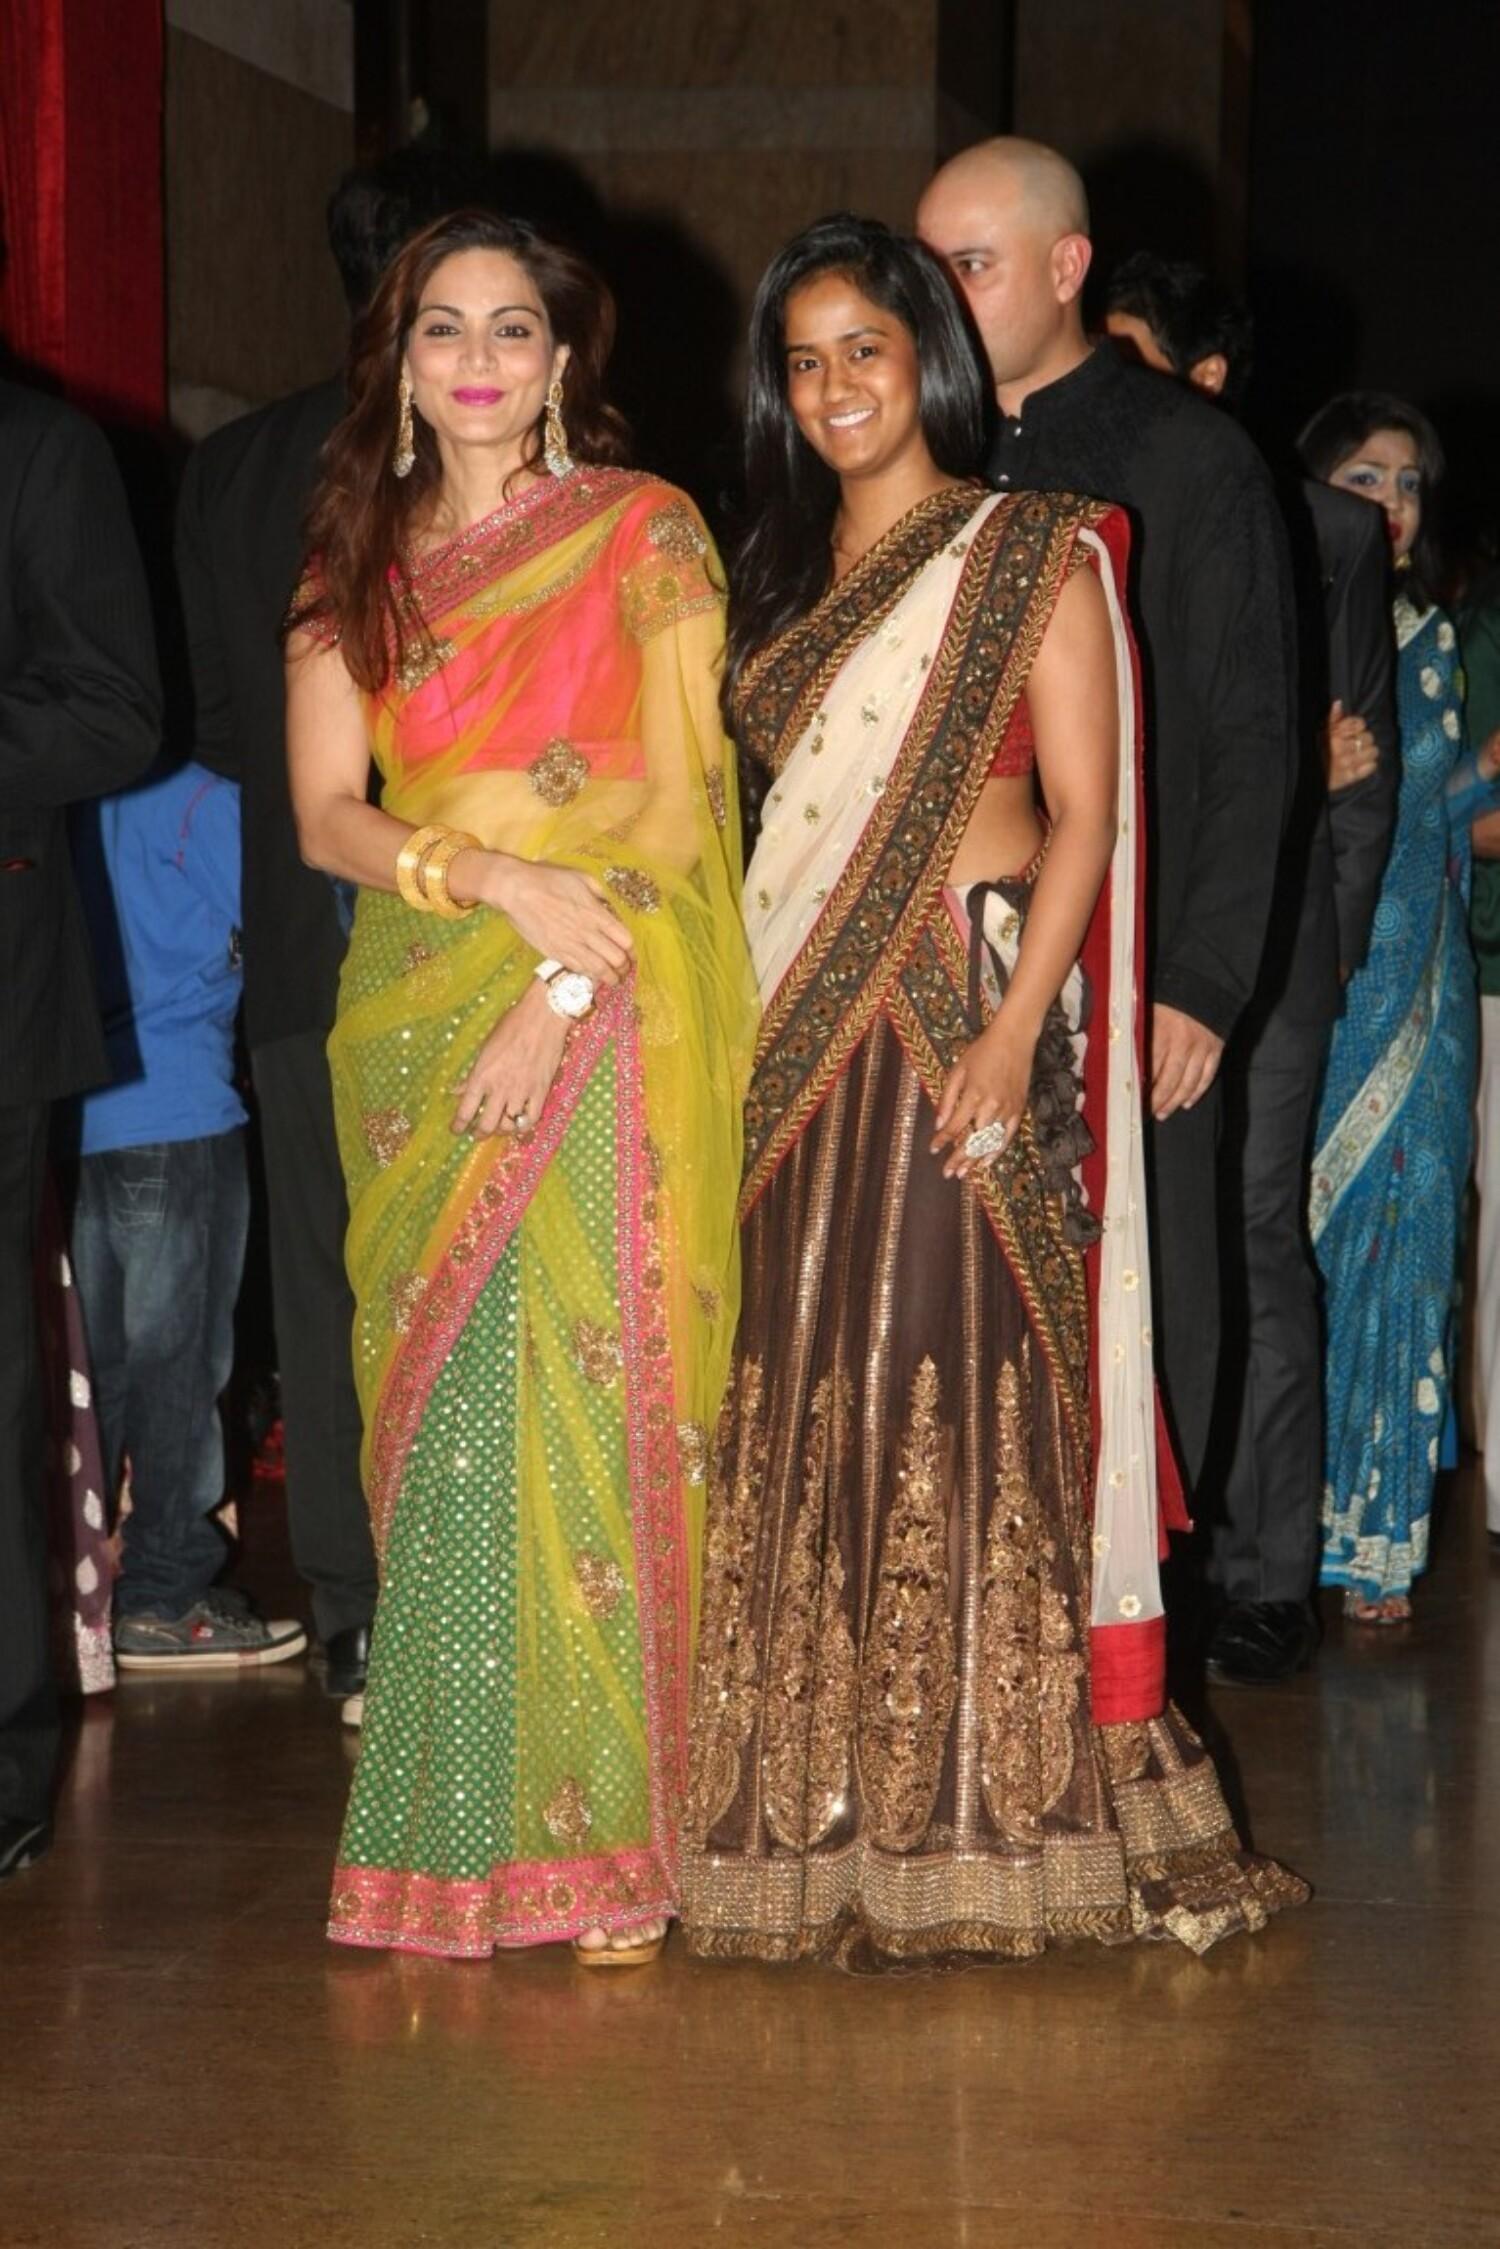 Salman-Khan-Alvira-Khan_Arpita-Khan-at-Ritesh-Deshmukh_Genelia-Wedding ...